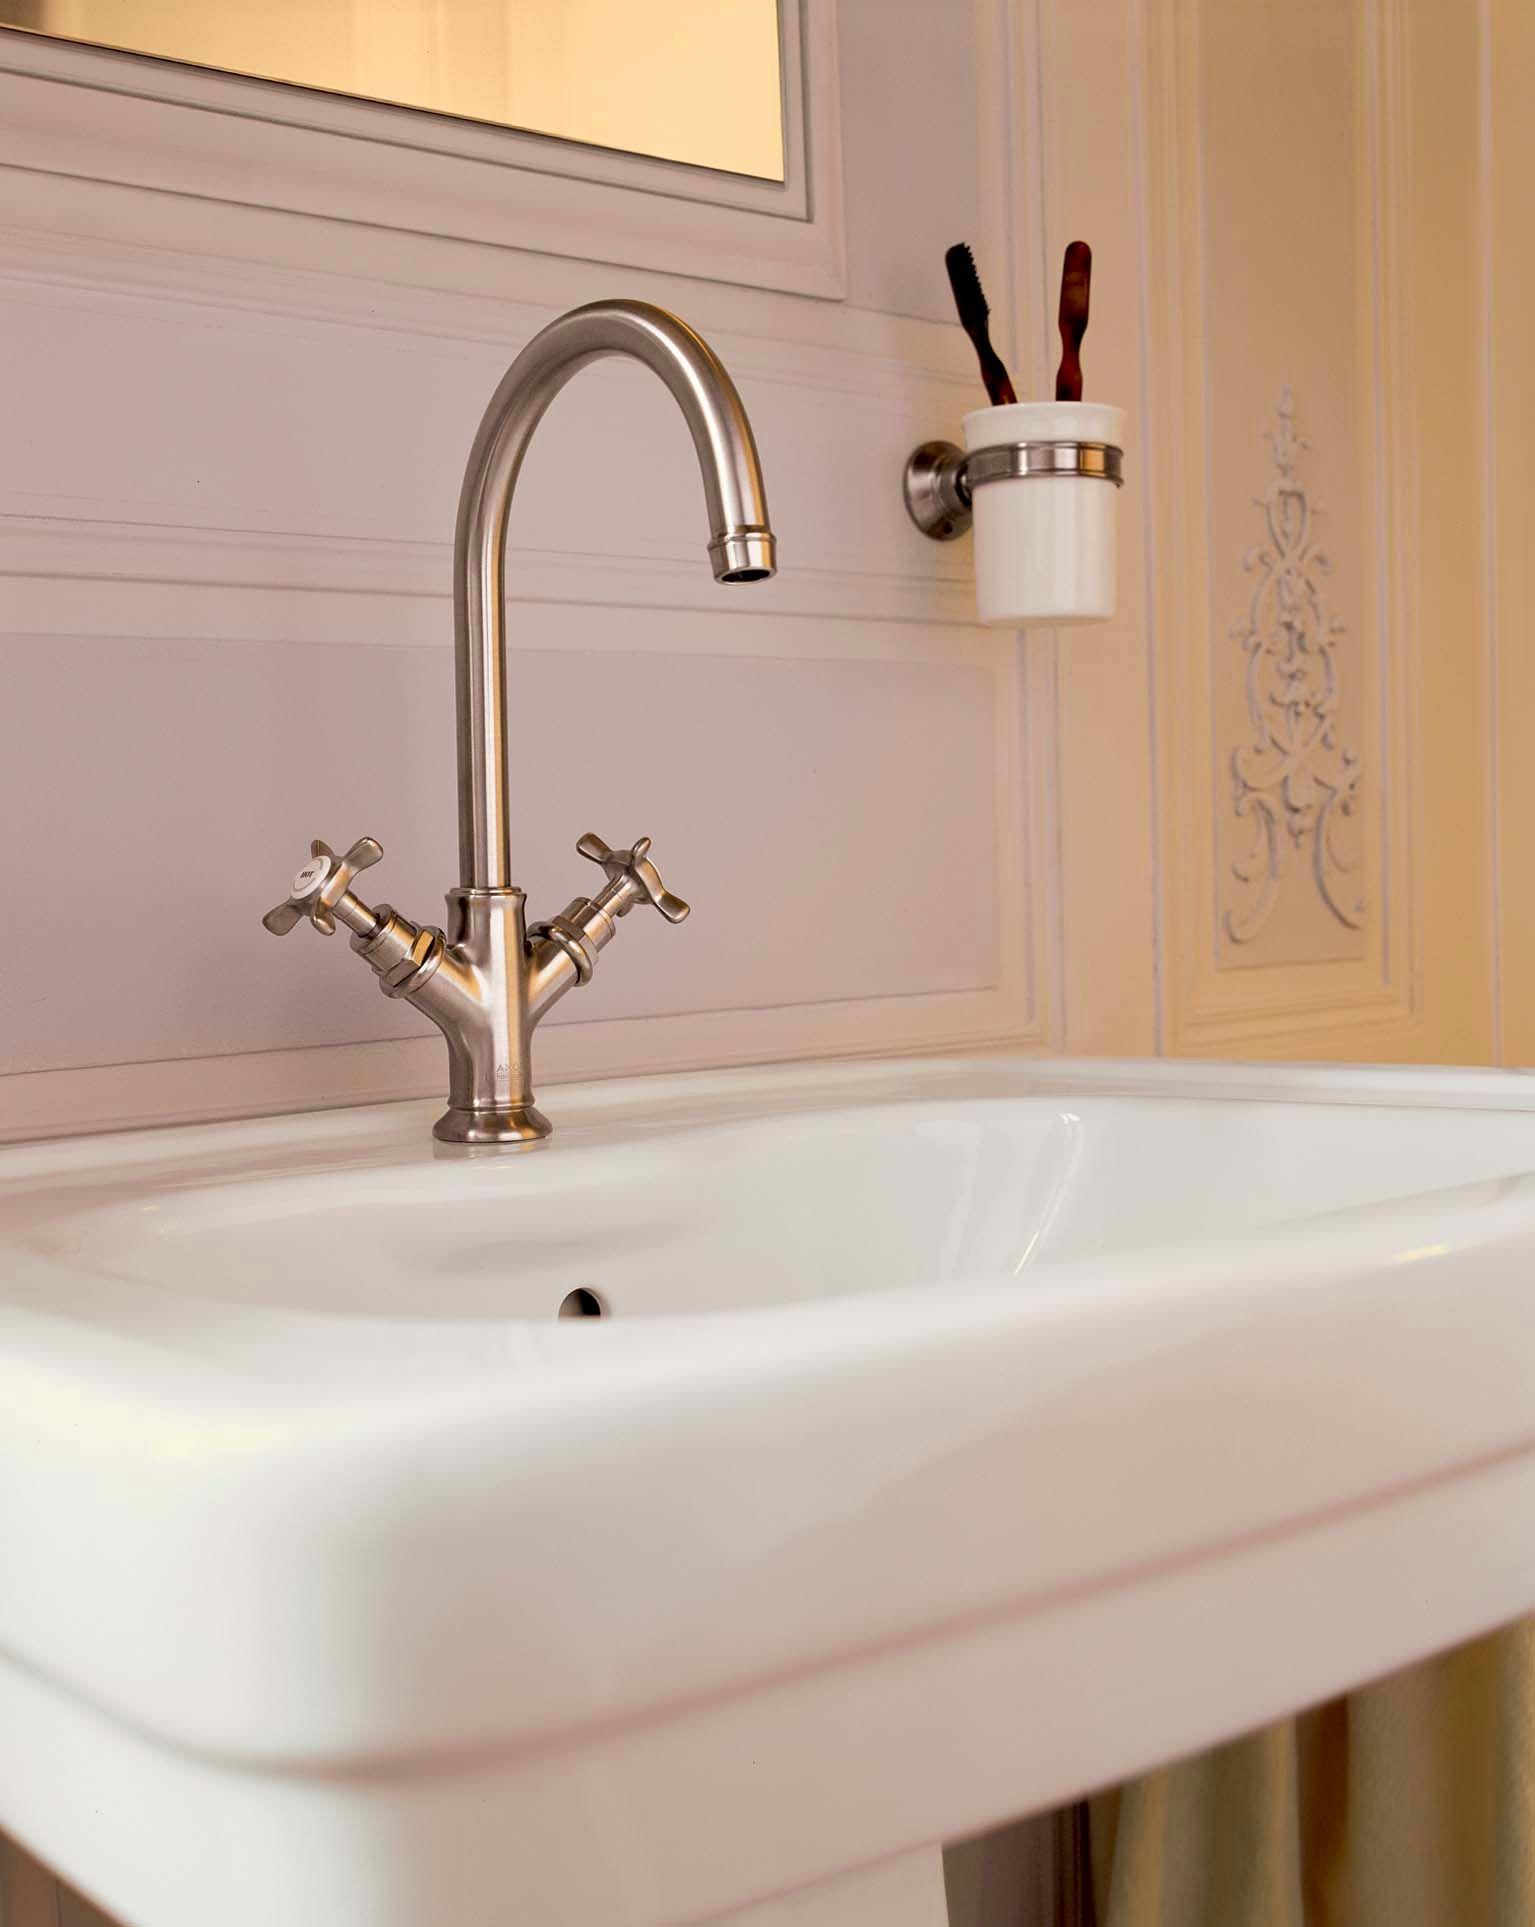 Axor Montreux Basin Mixer | Master Bath | Pinterest | Basin mixer ...